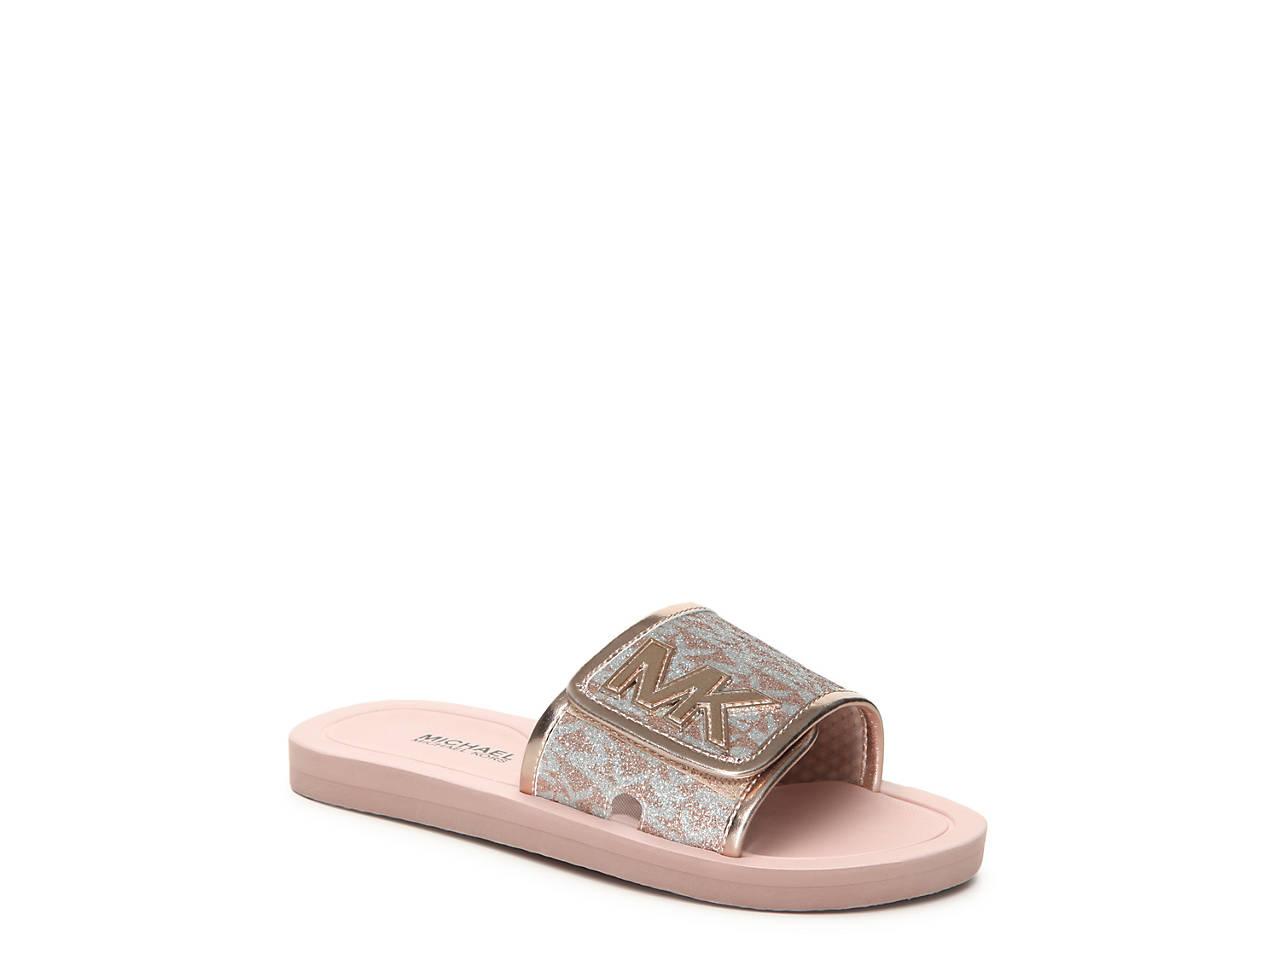 9192d116bd55 Michael Michael Kors Eli Seneca Toddler   Youth Slide Sandal Kids ...